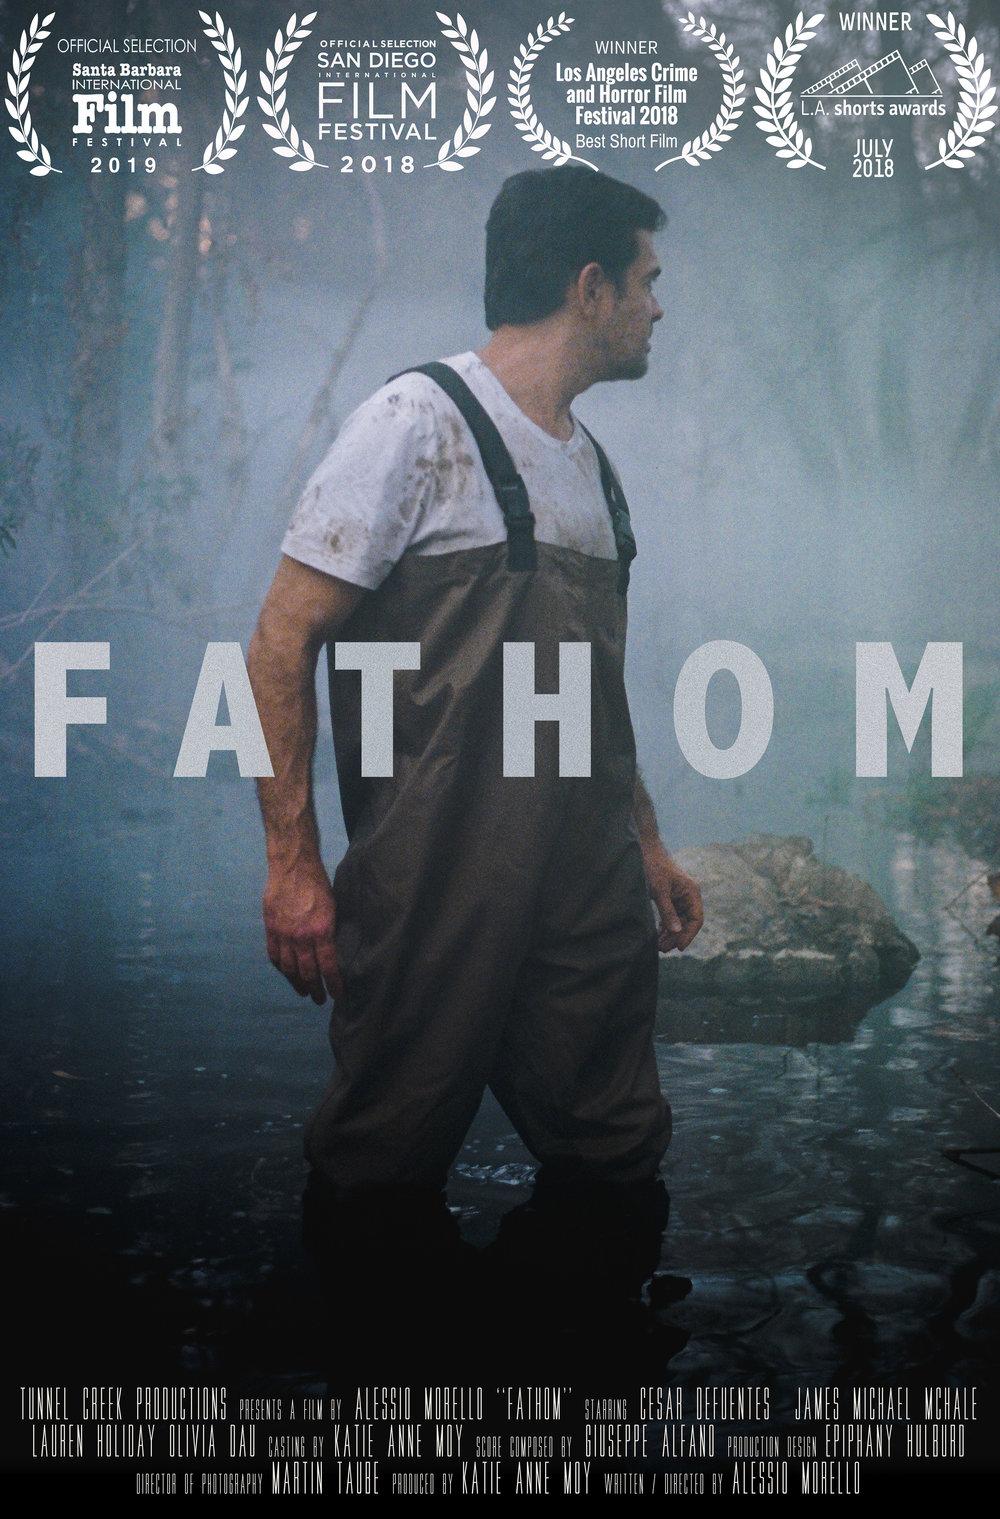 """Fathom"" Dir. Alessio Morello"